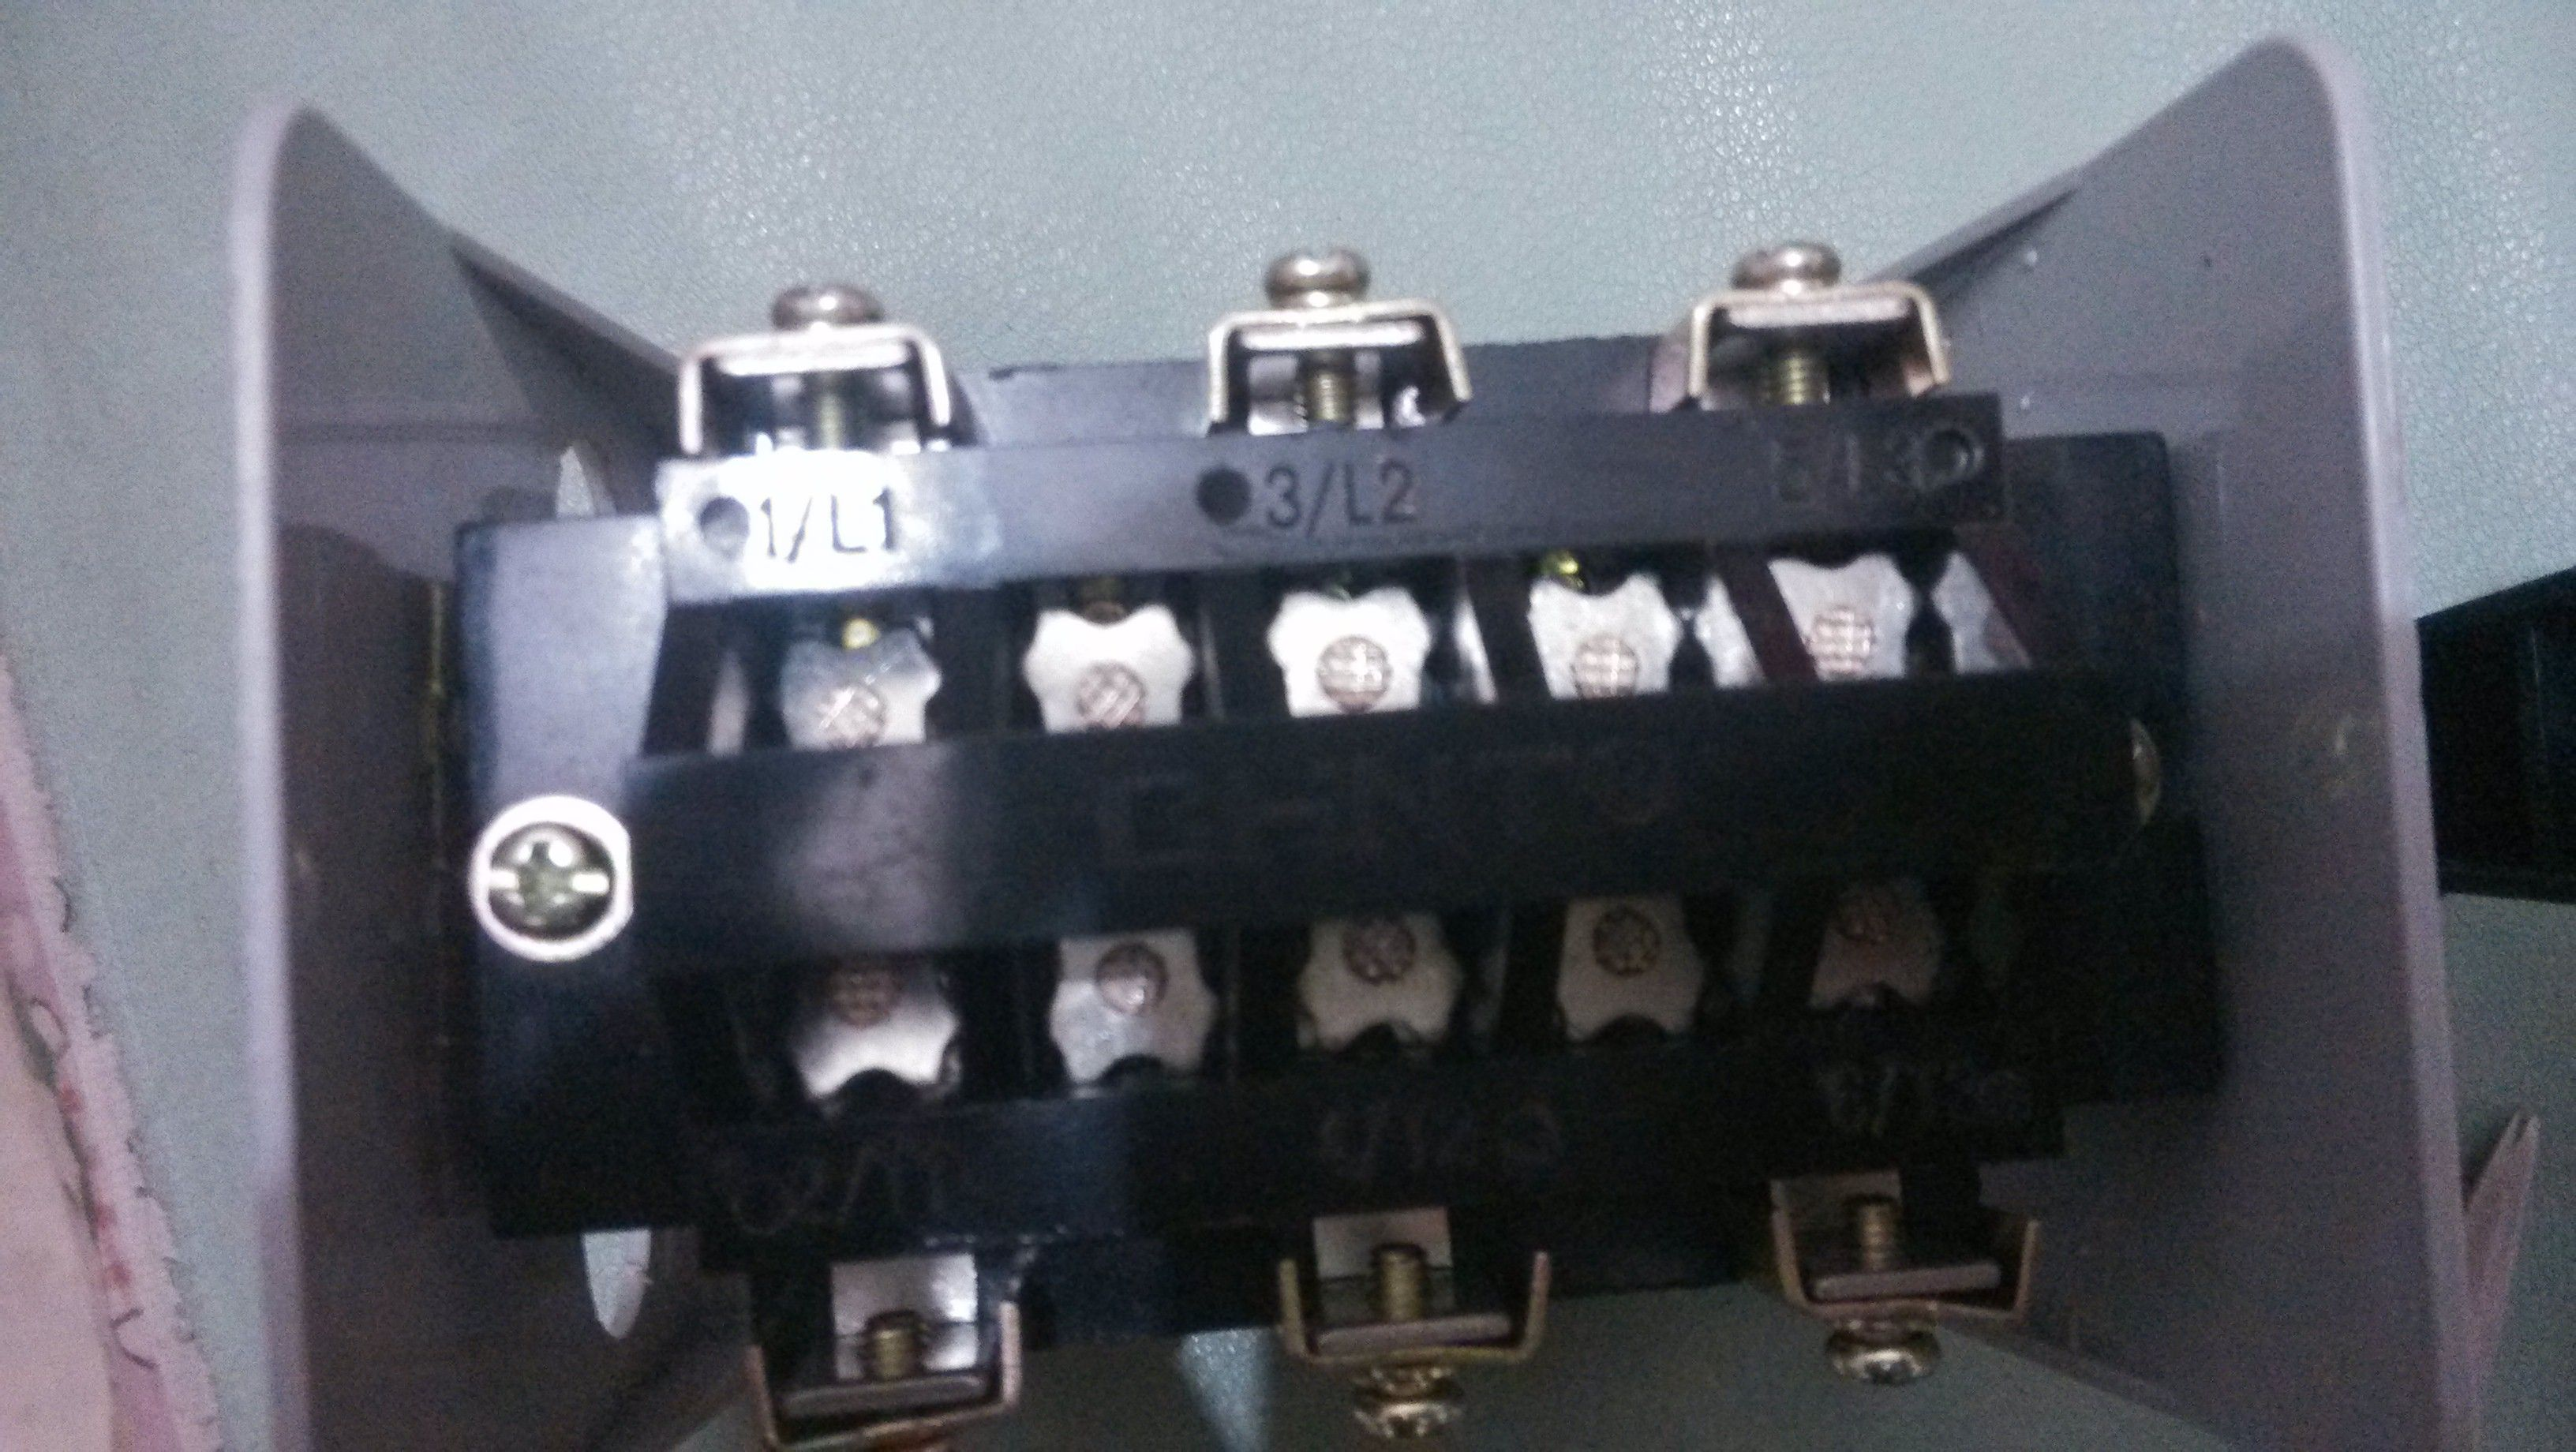 yh2 系列倒顺开关 接两项电机倒正转